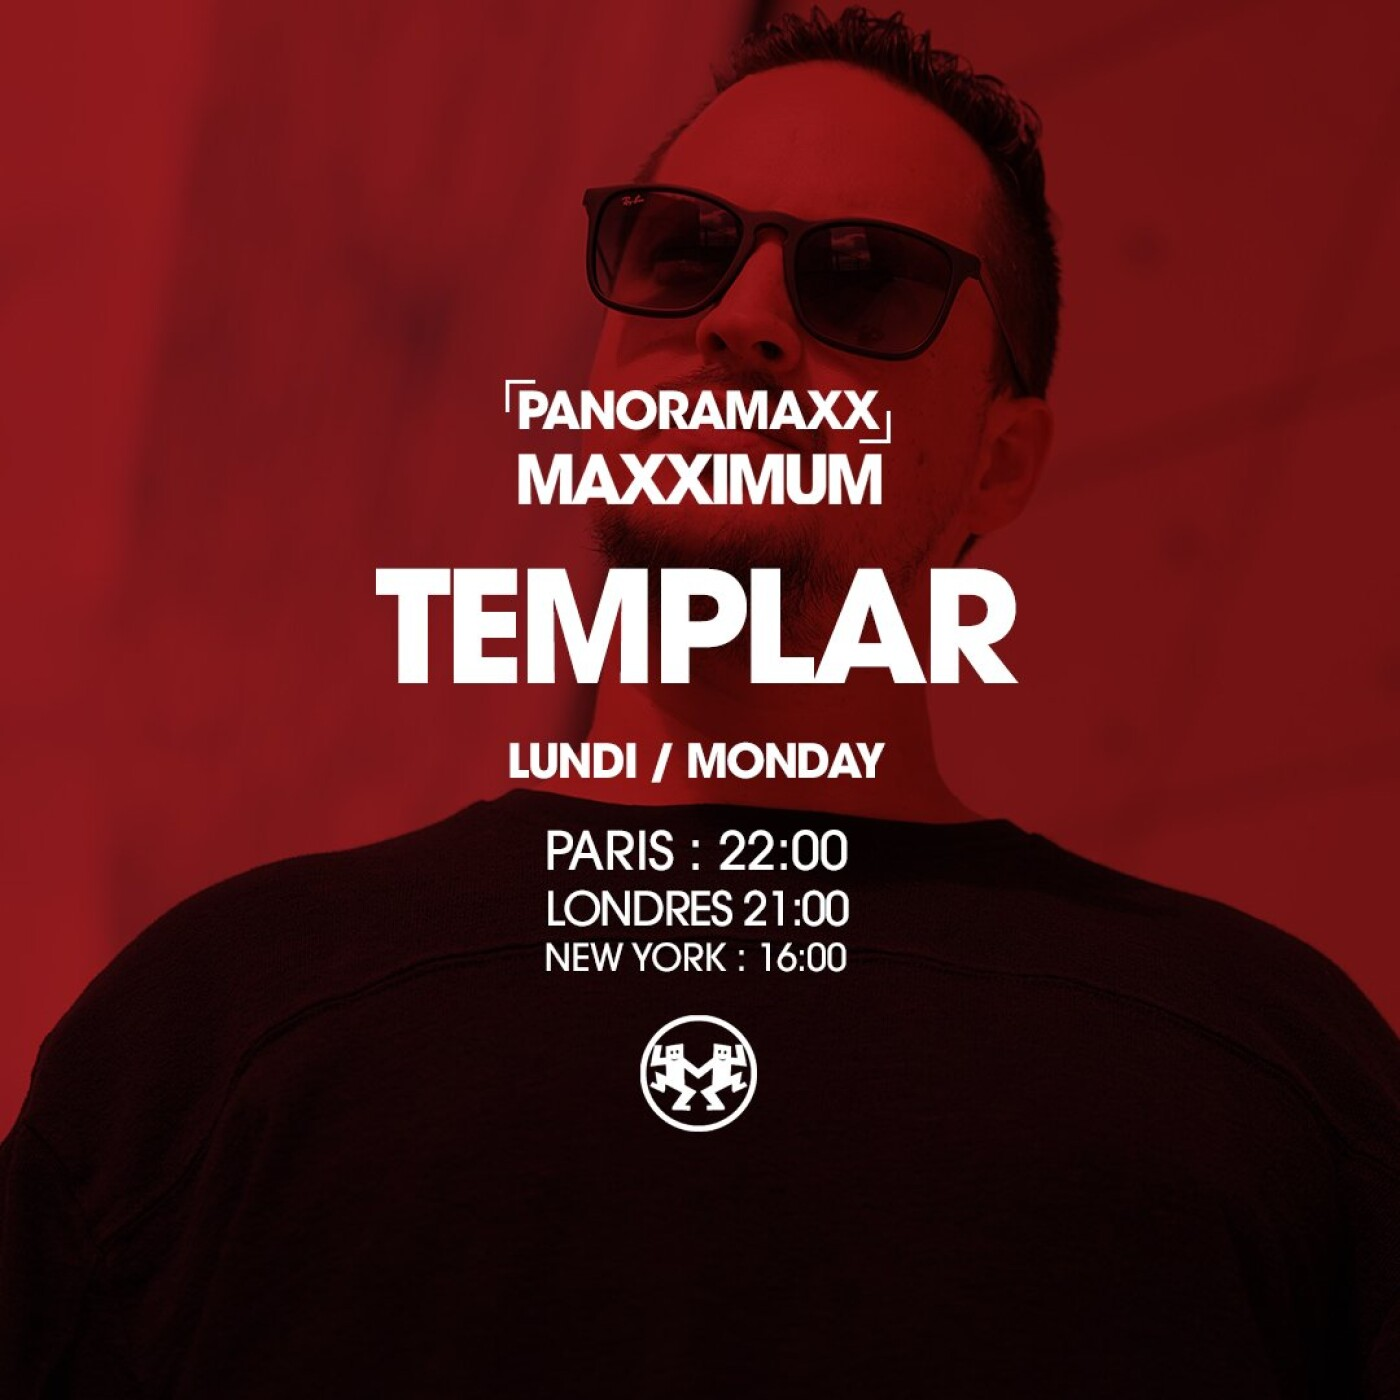 PANORAMAXX : TEMPLAR